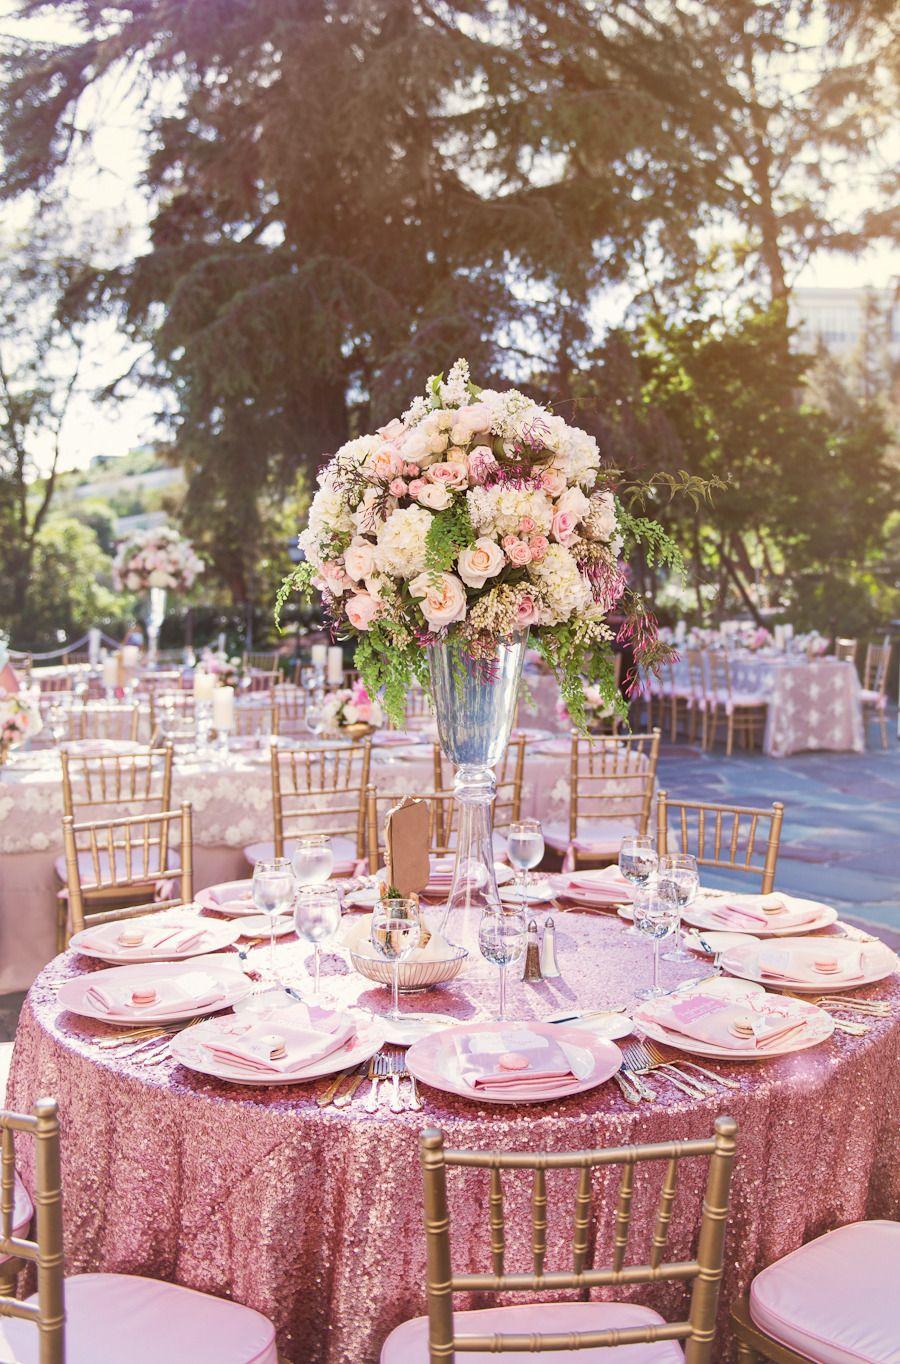 Beverly Hills Wedding At Greystone Mansion